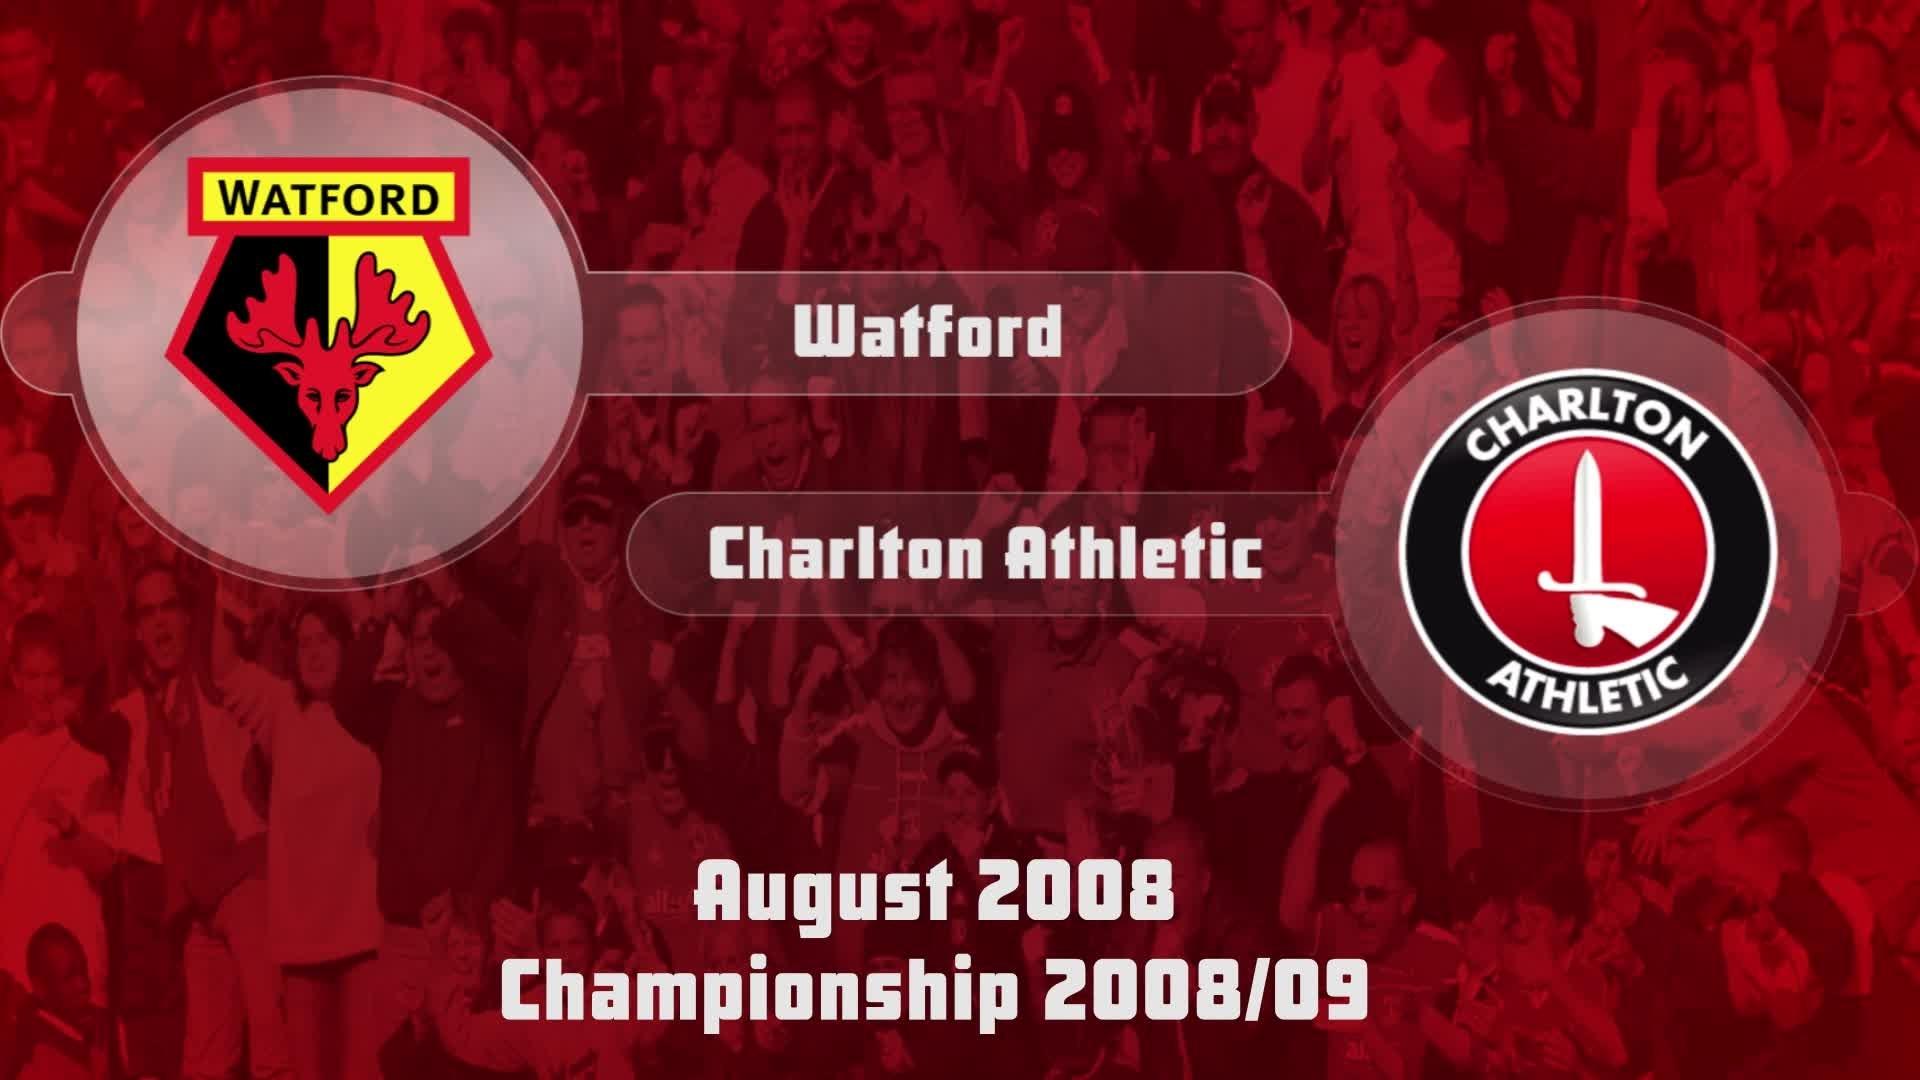 03 HIGHLIGHTS | Watford 1 Charlton 0 (Aug 2008)